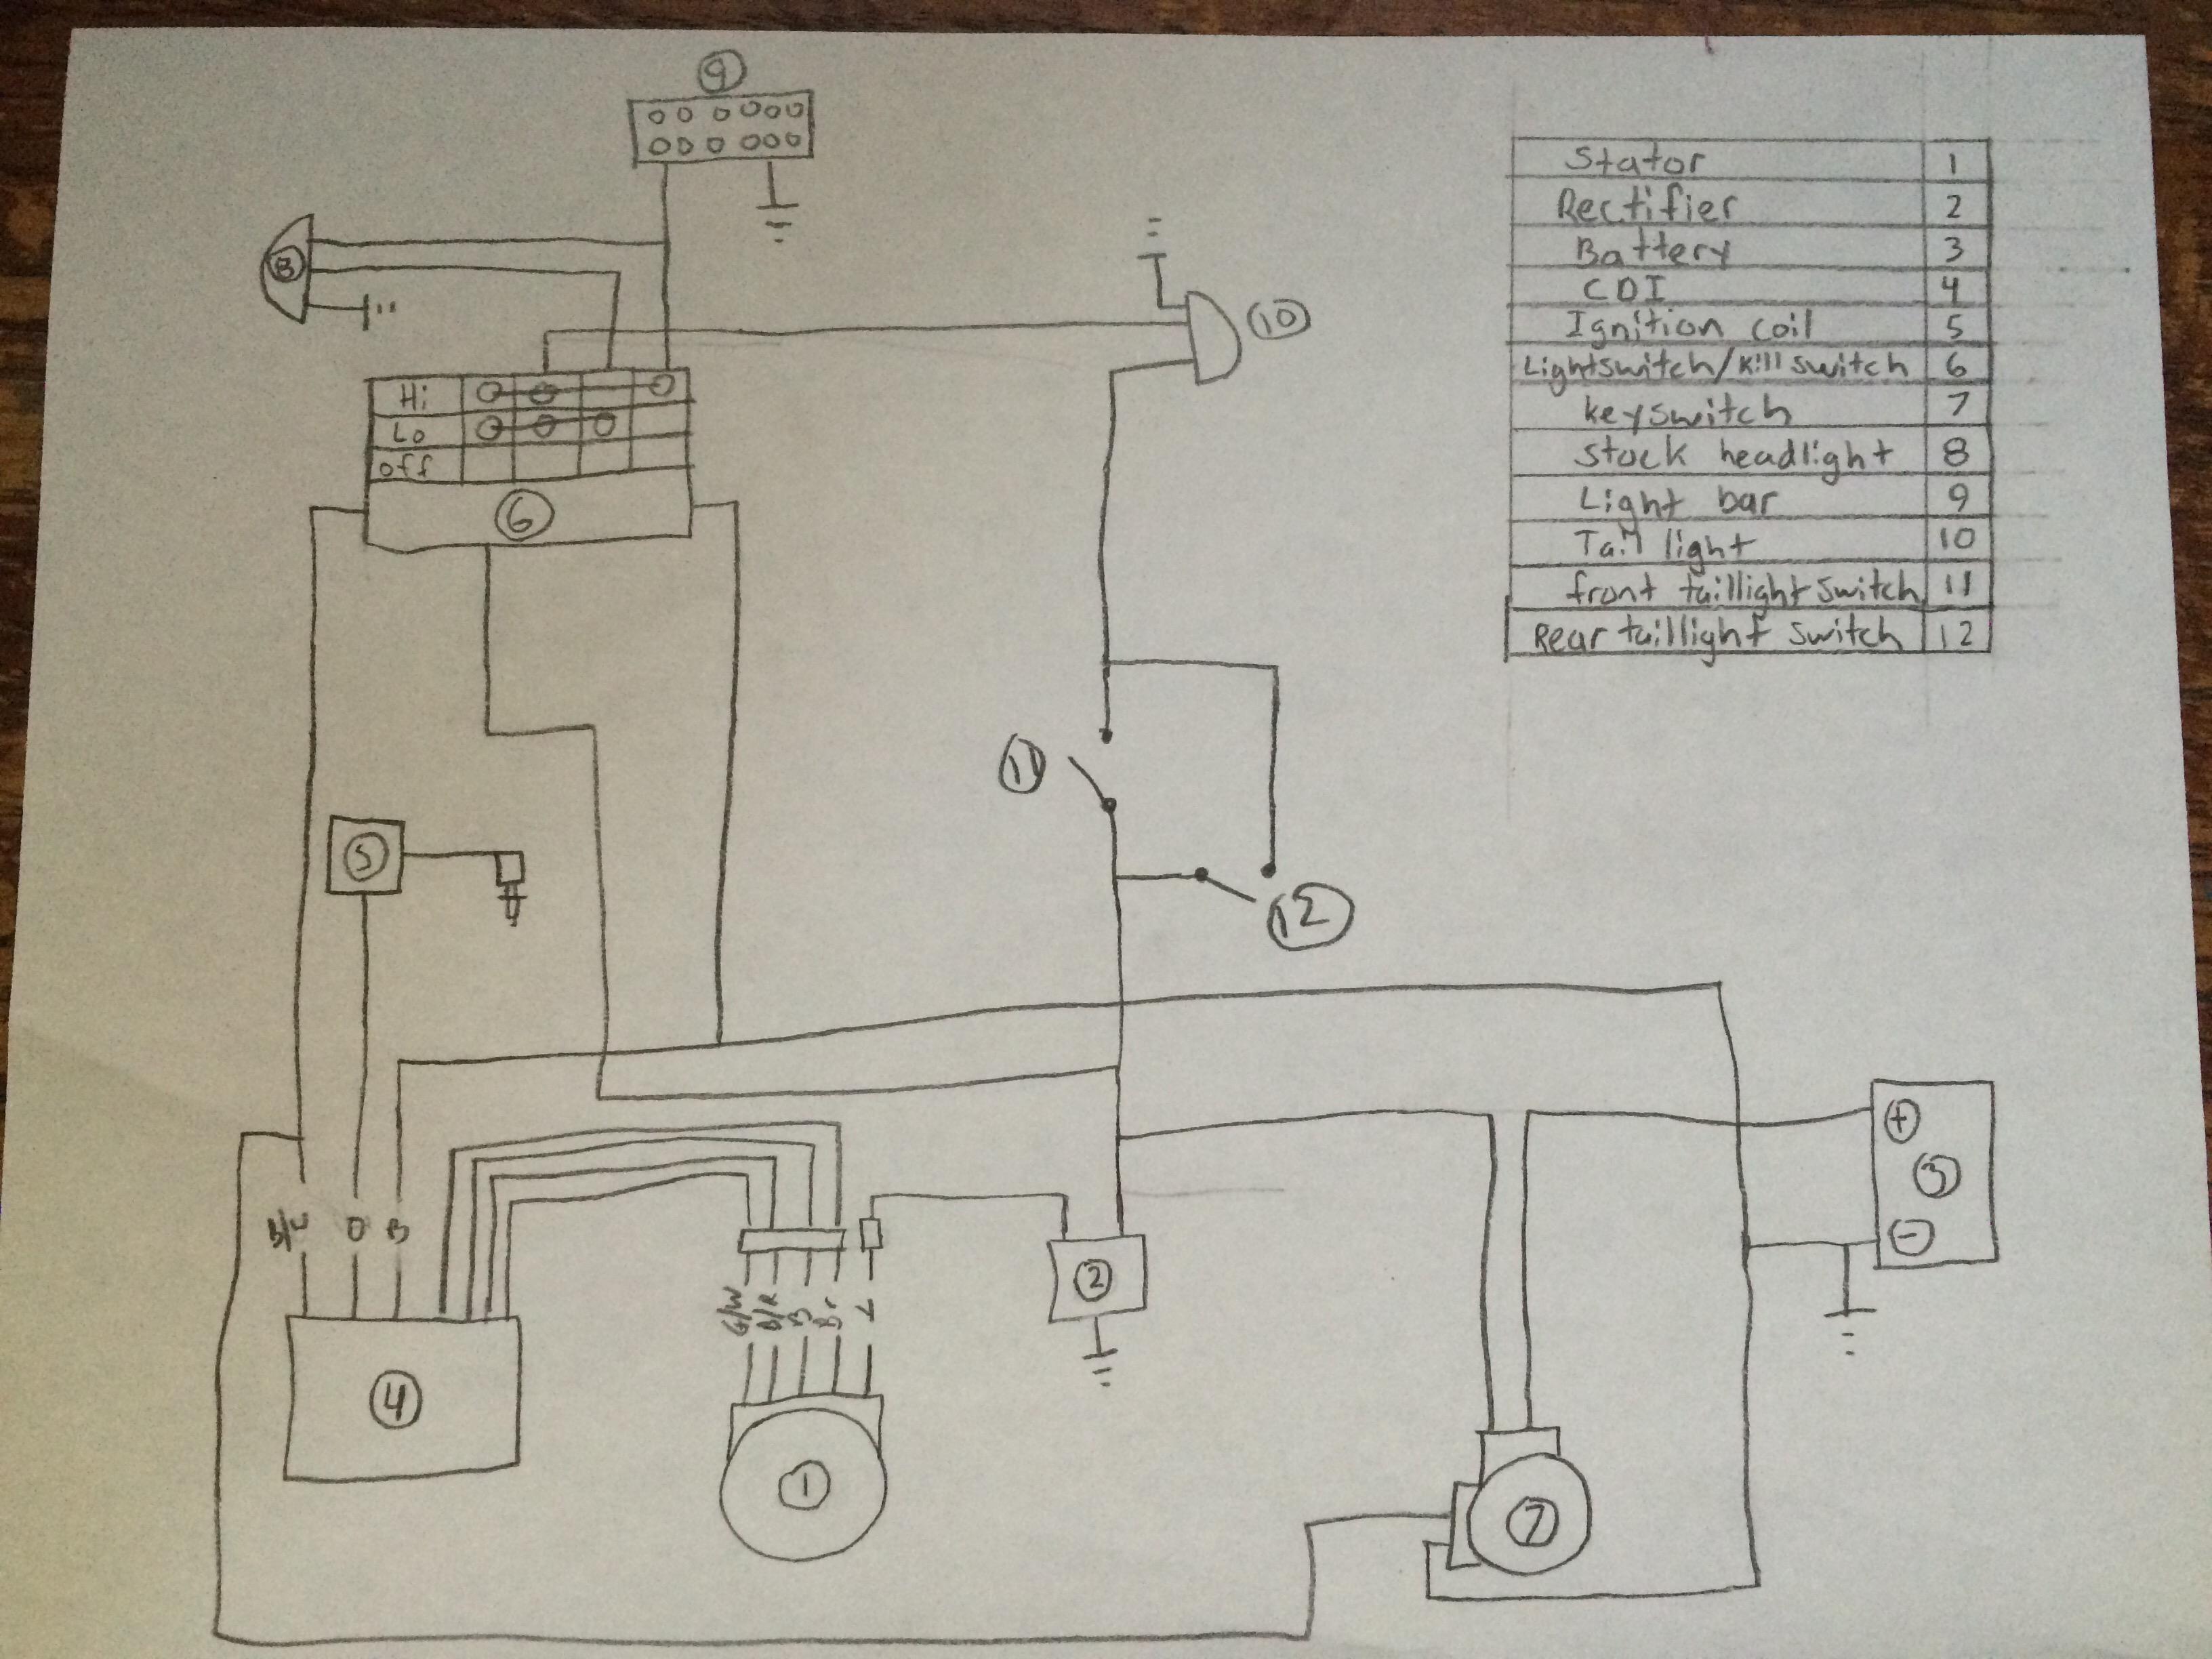 YD_6418] 1994 Yamaha Yz 250 Wiring Diagram Schematic WiringLoskopri Hendil Weasi Anal Hendil Nekout Expe Nnigh Benkeme Mohammedshrine  Librar Wiring 101